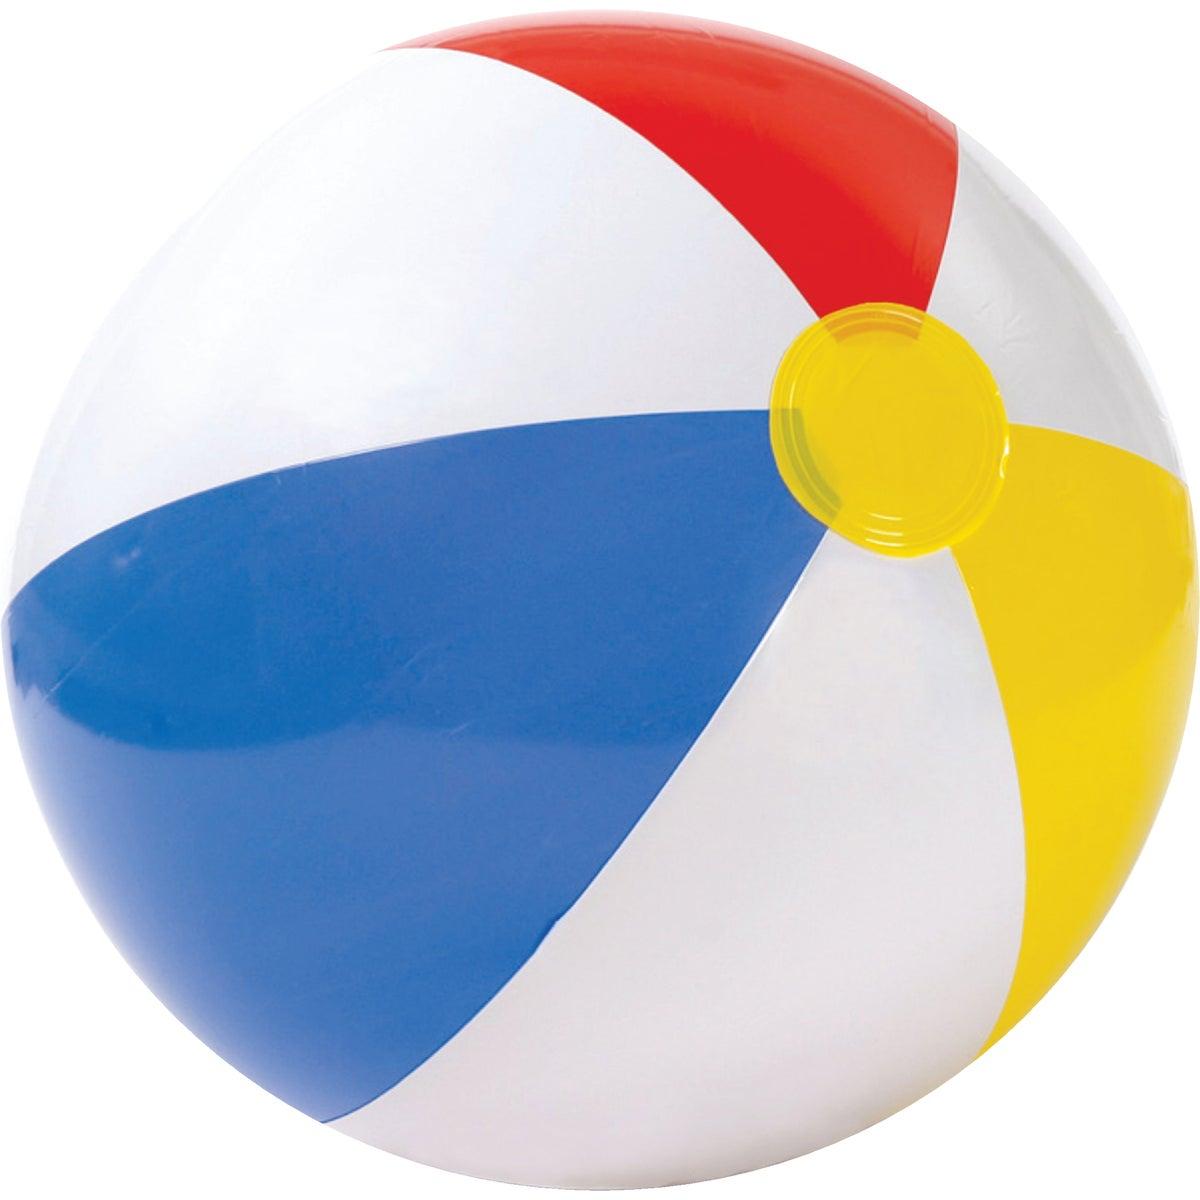 GLOSSY PANEL BALL